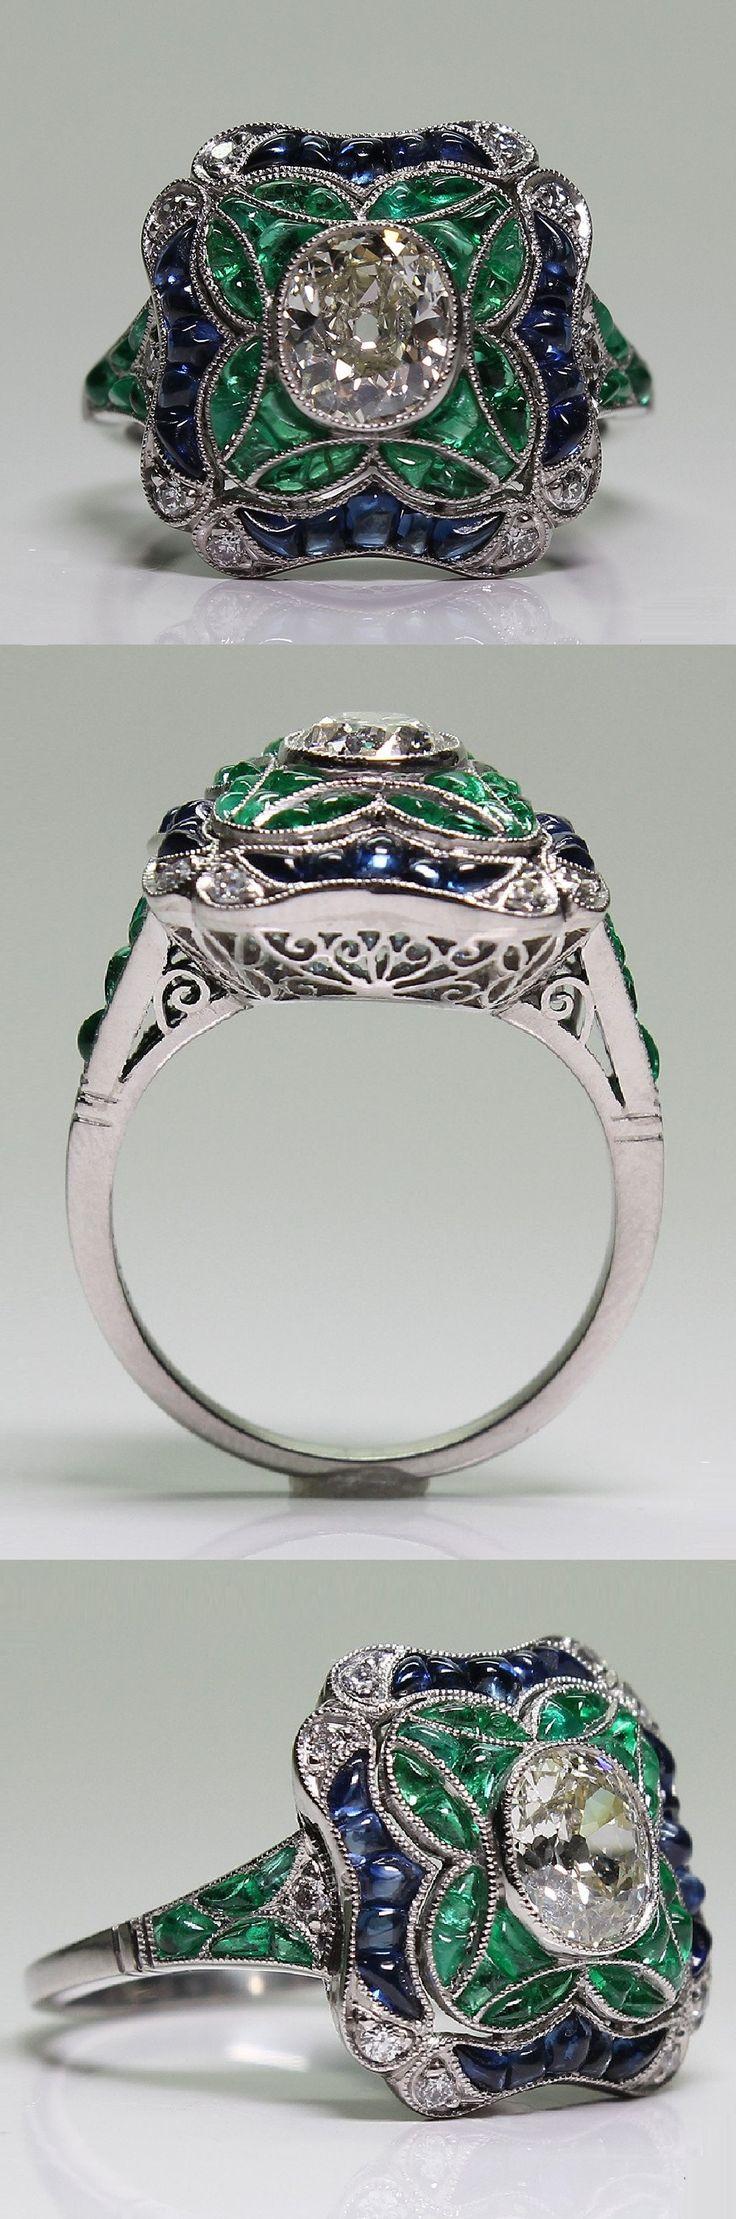 An Art Deco platinum, diamond, sapphire and emerald ring, 1920-35. #ArtDeco #ring